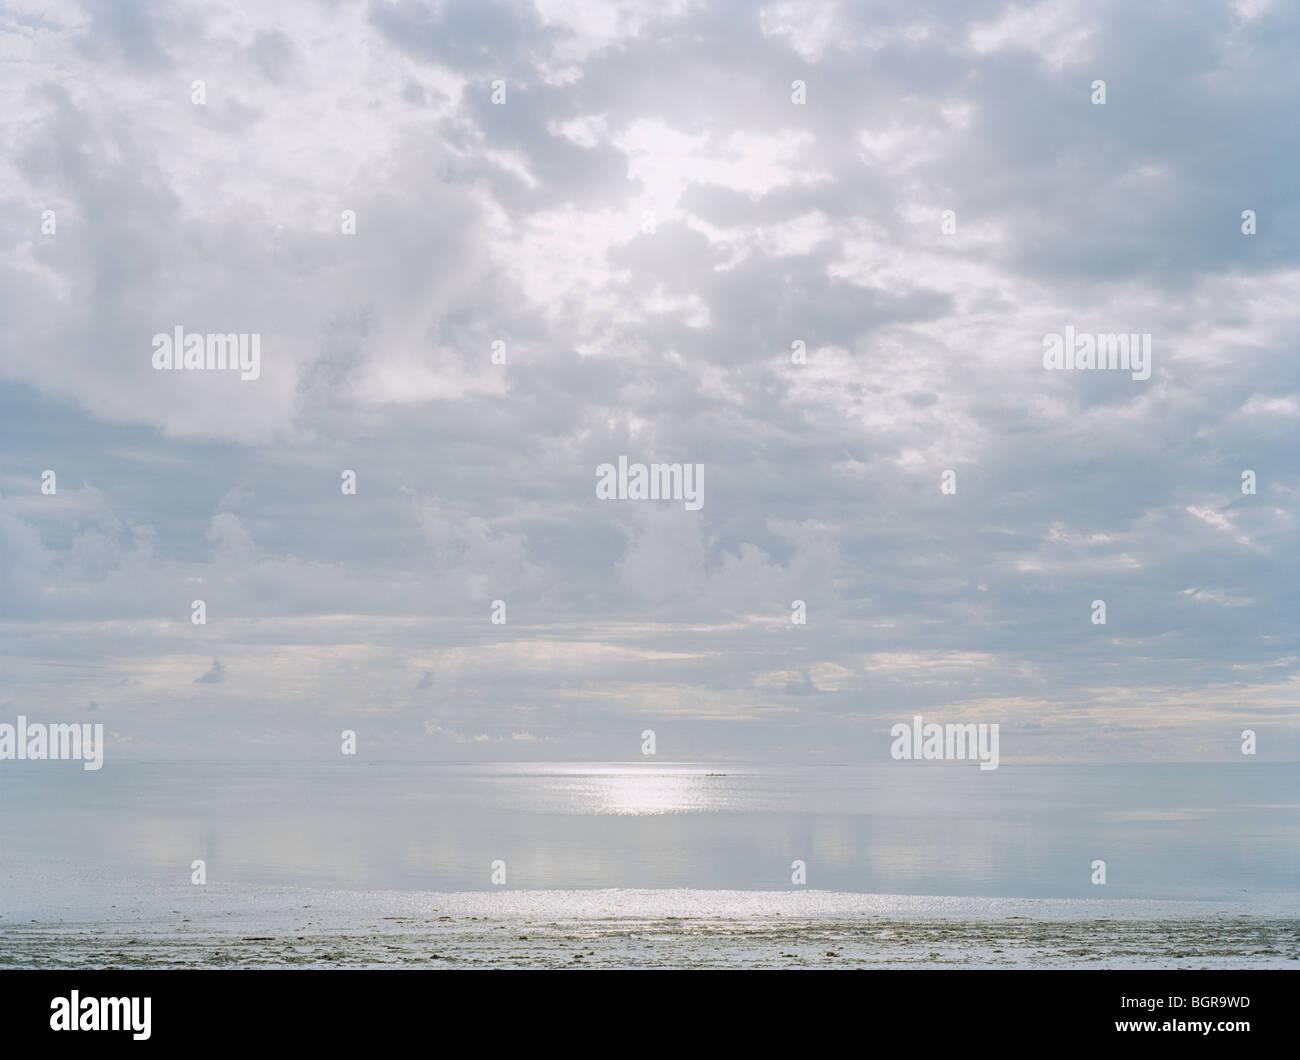 Heaven and ocean - Stock Image